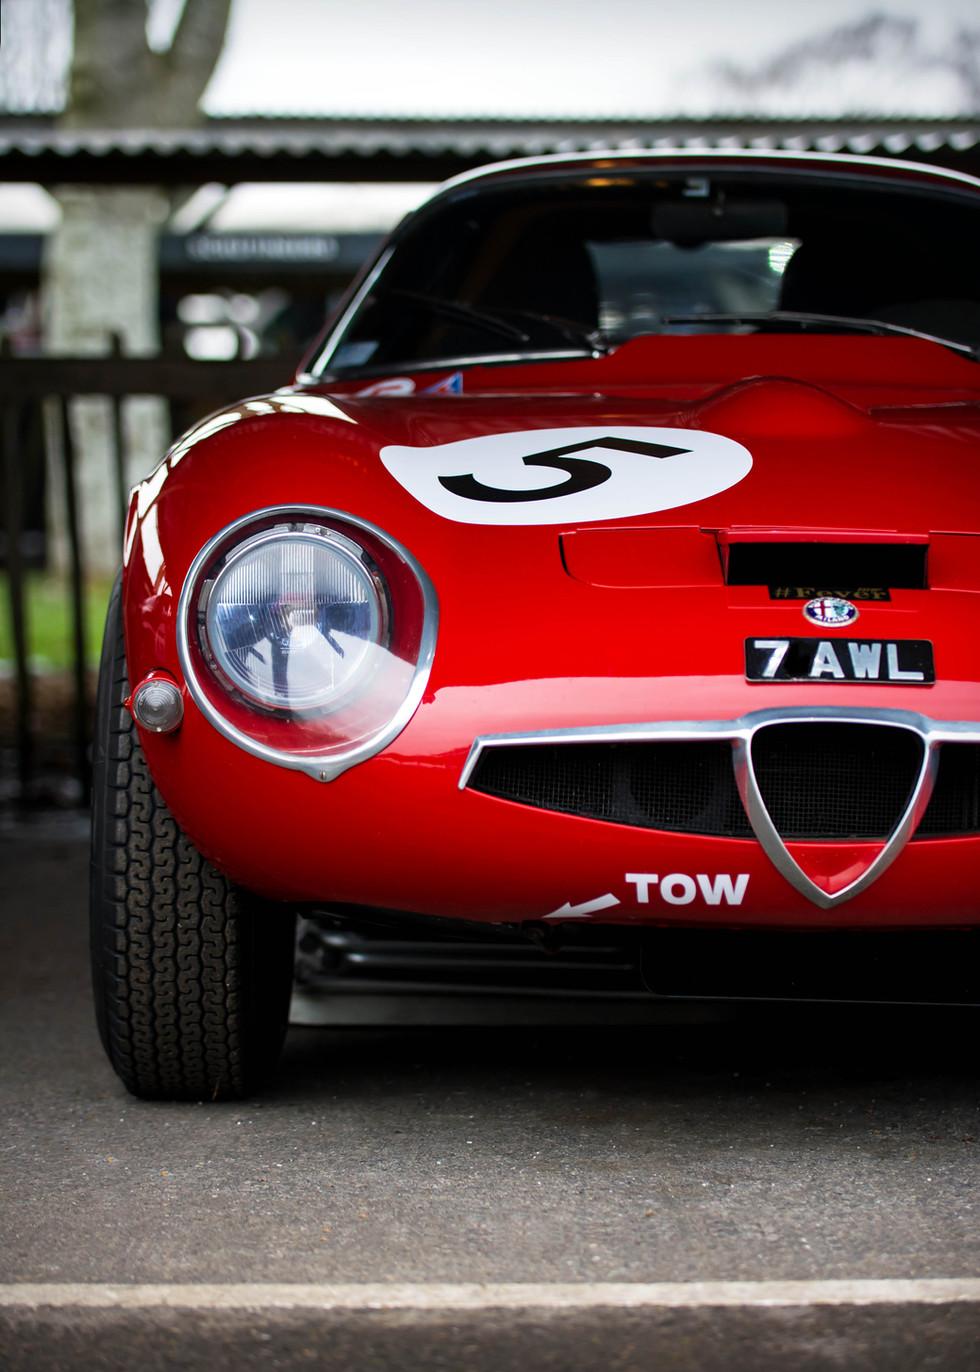 John Bennett's 1965 Alfa Romeo Giulia TZ1 at the Goodwood 76MM